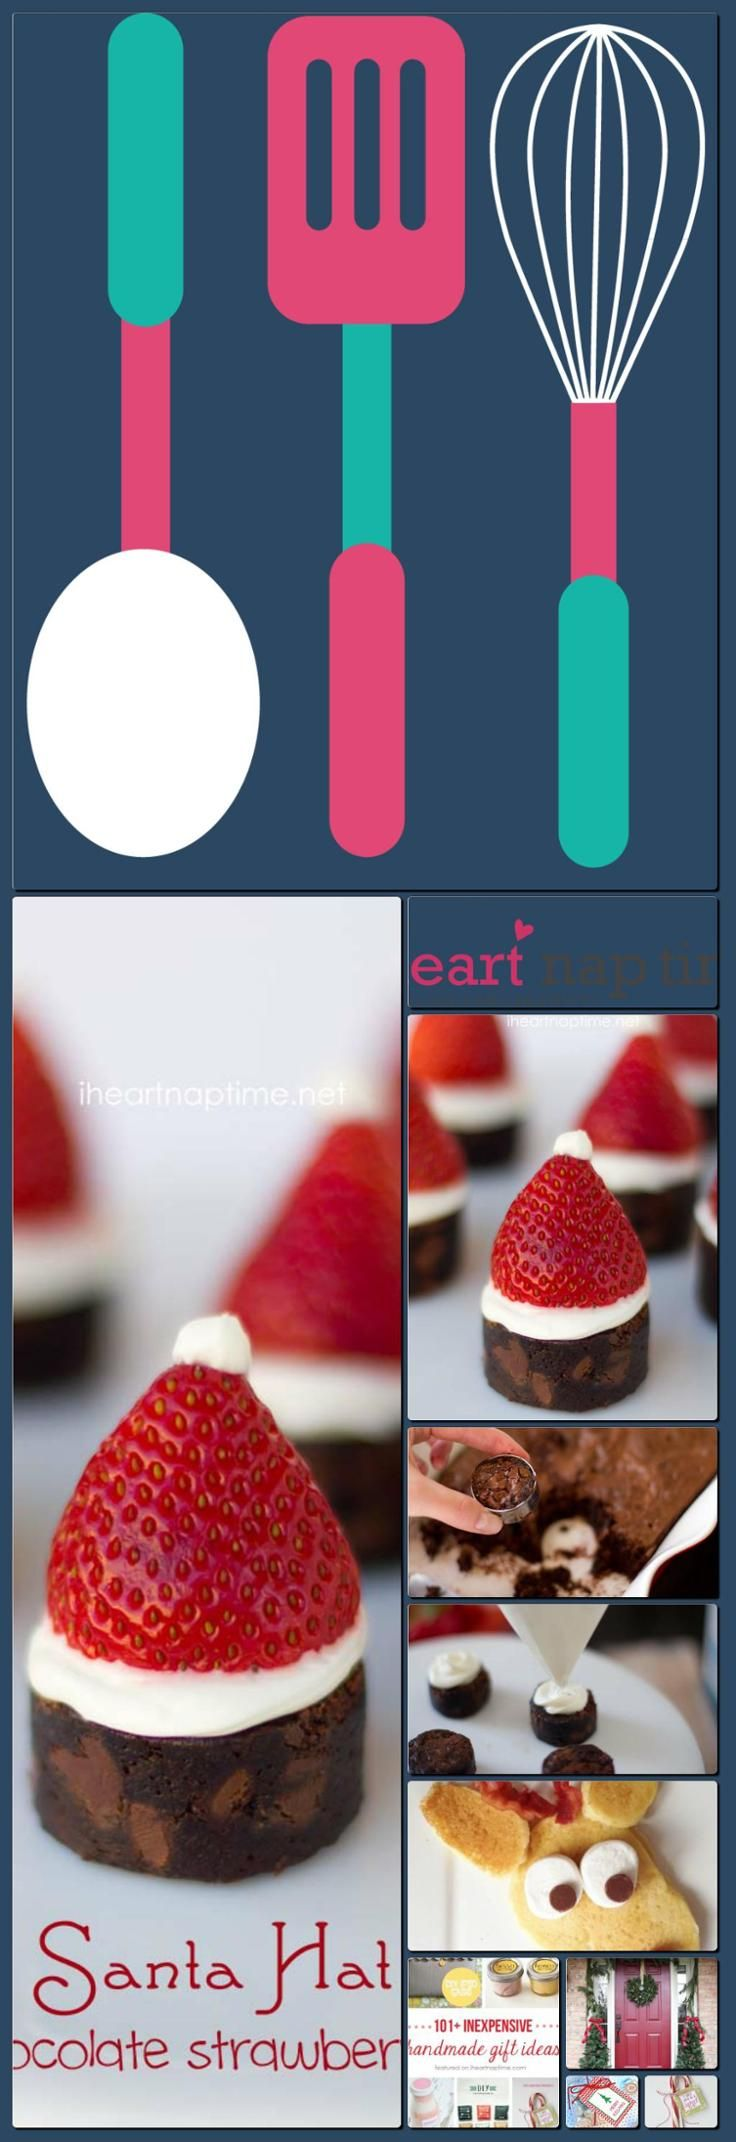 how to make strawberry santa hats